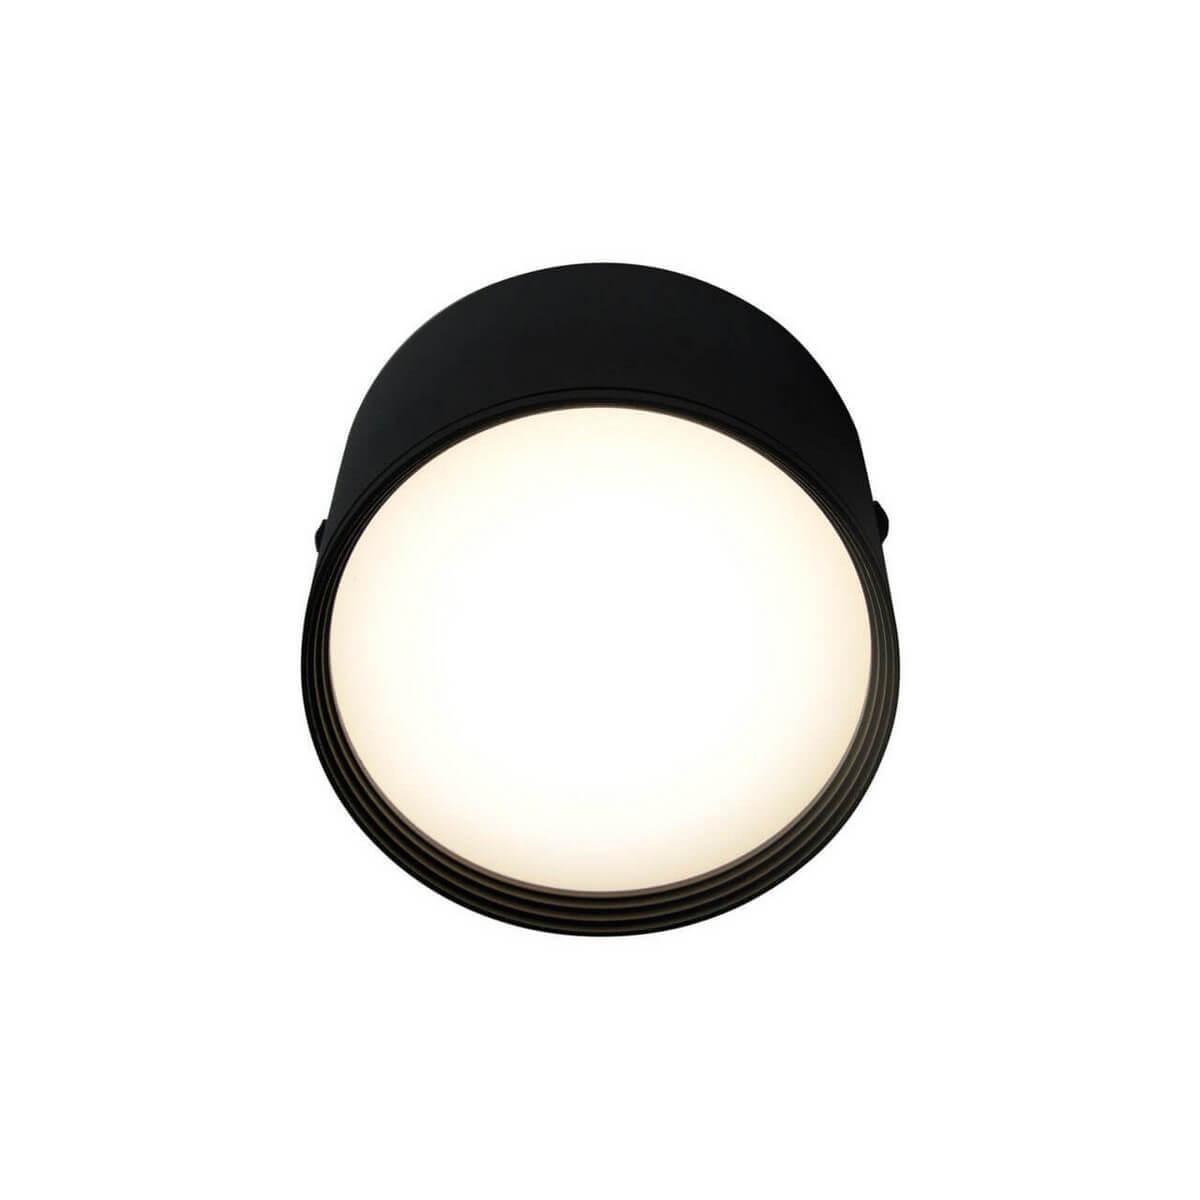 Фото - Накладной светильник Kink Light 05410,19, LED, 7 Вт накладной светильник kink light фейерверк 08013